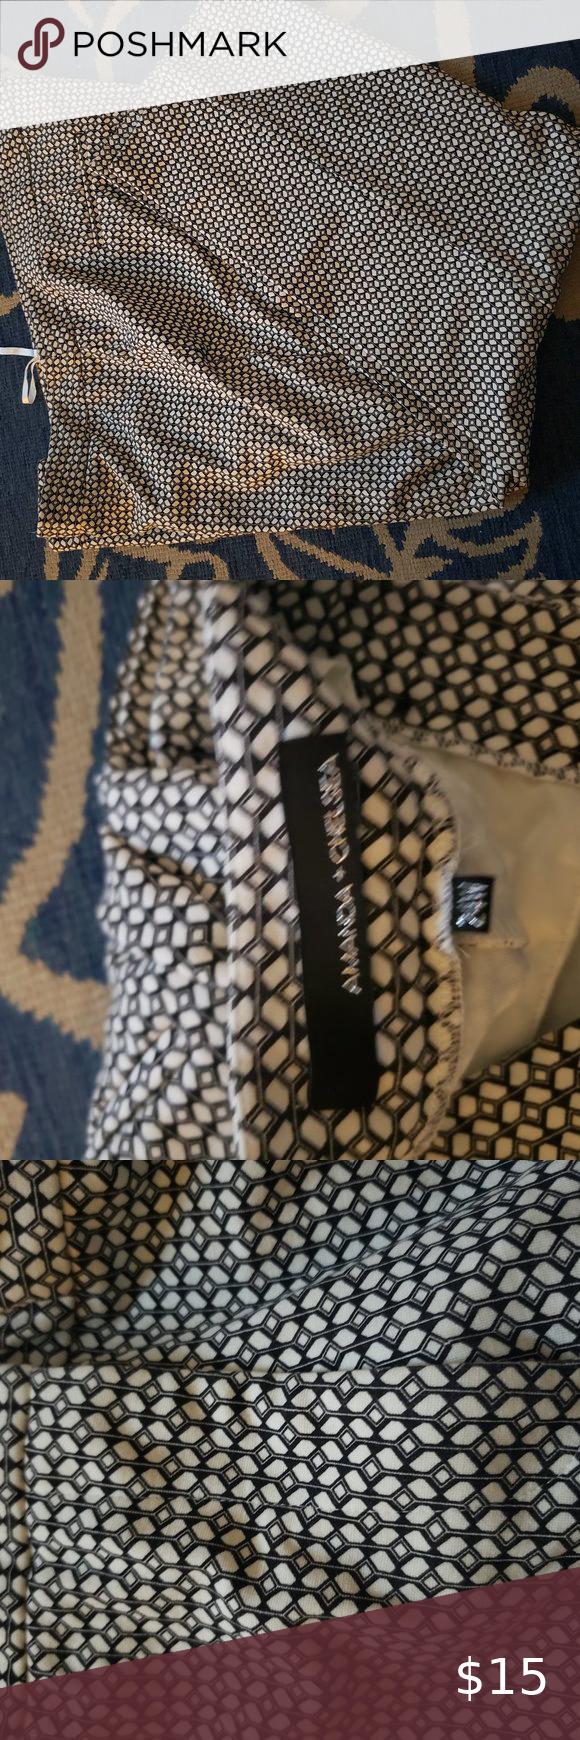 Amanda & Chelsea Black and White Slacks Black and white pattern slacks inseam 28 inches. Waist to hem is 37 1/2 inches. Amanda & Chelsea Pants Ankle & Cropped #whiteslacks